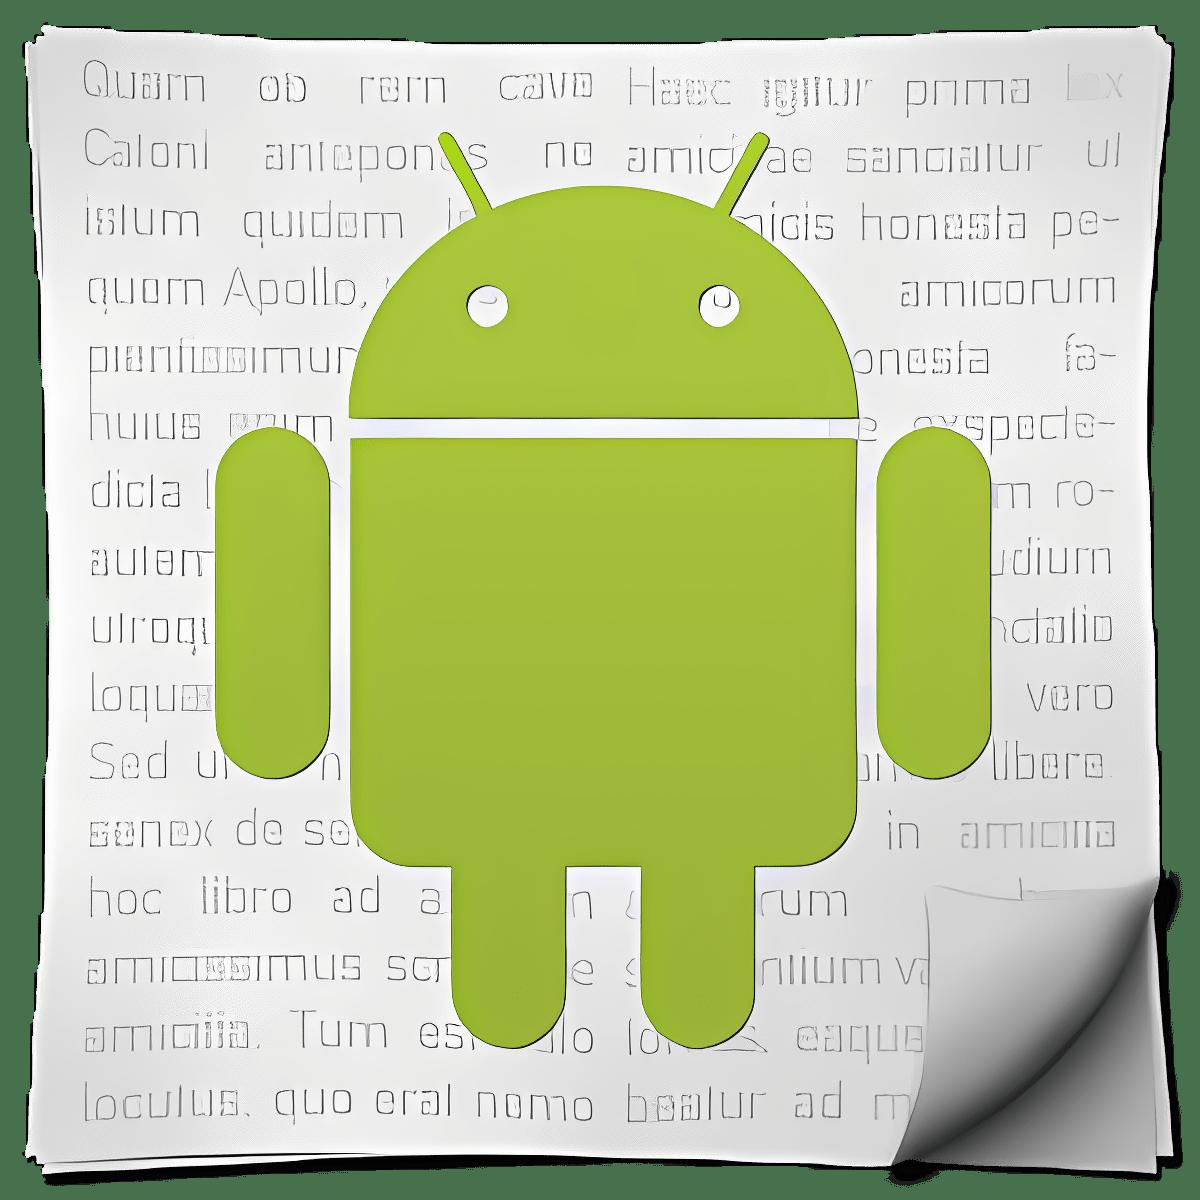 Noticias sobre Android device-dependant